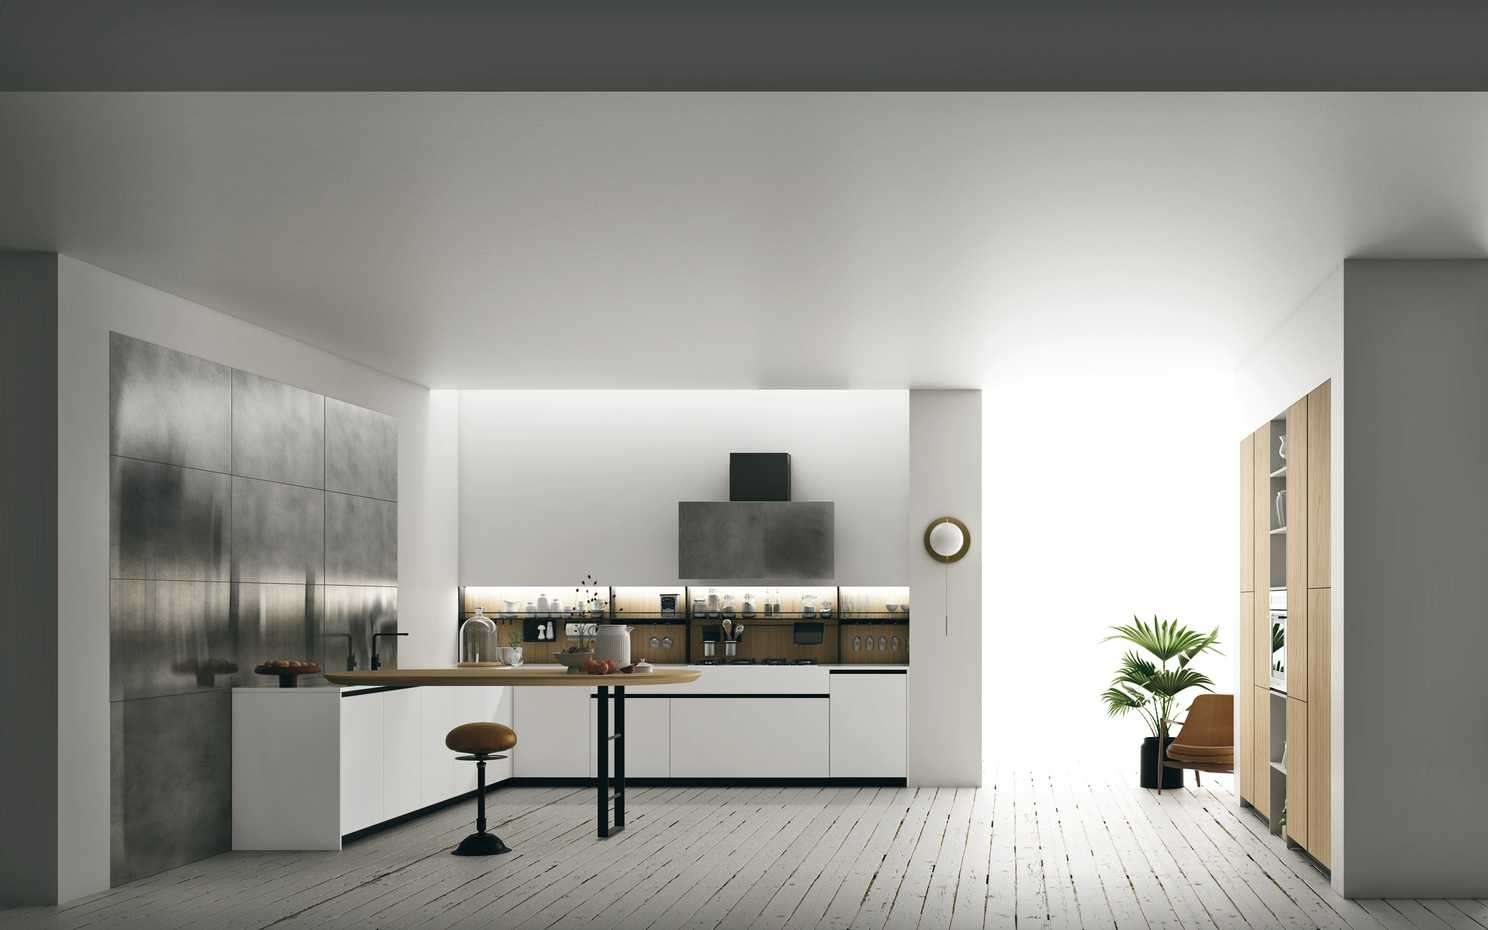 SoHo by Doimo Cucine product image 3